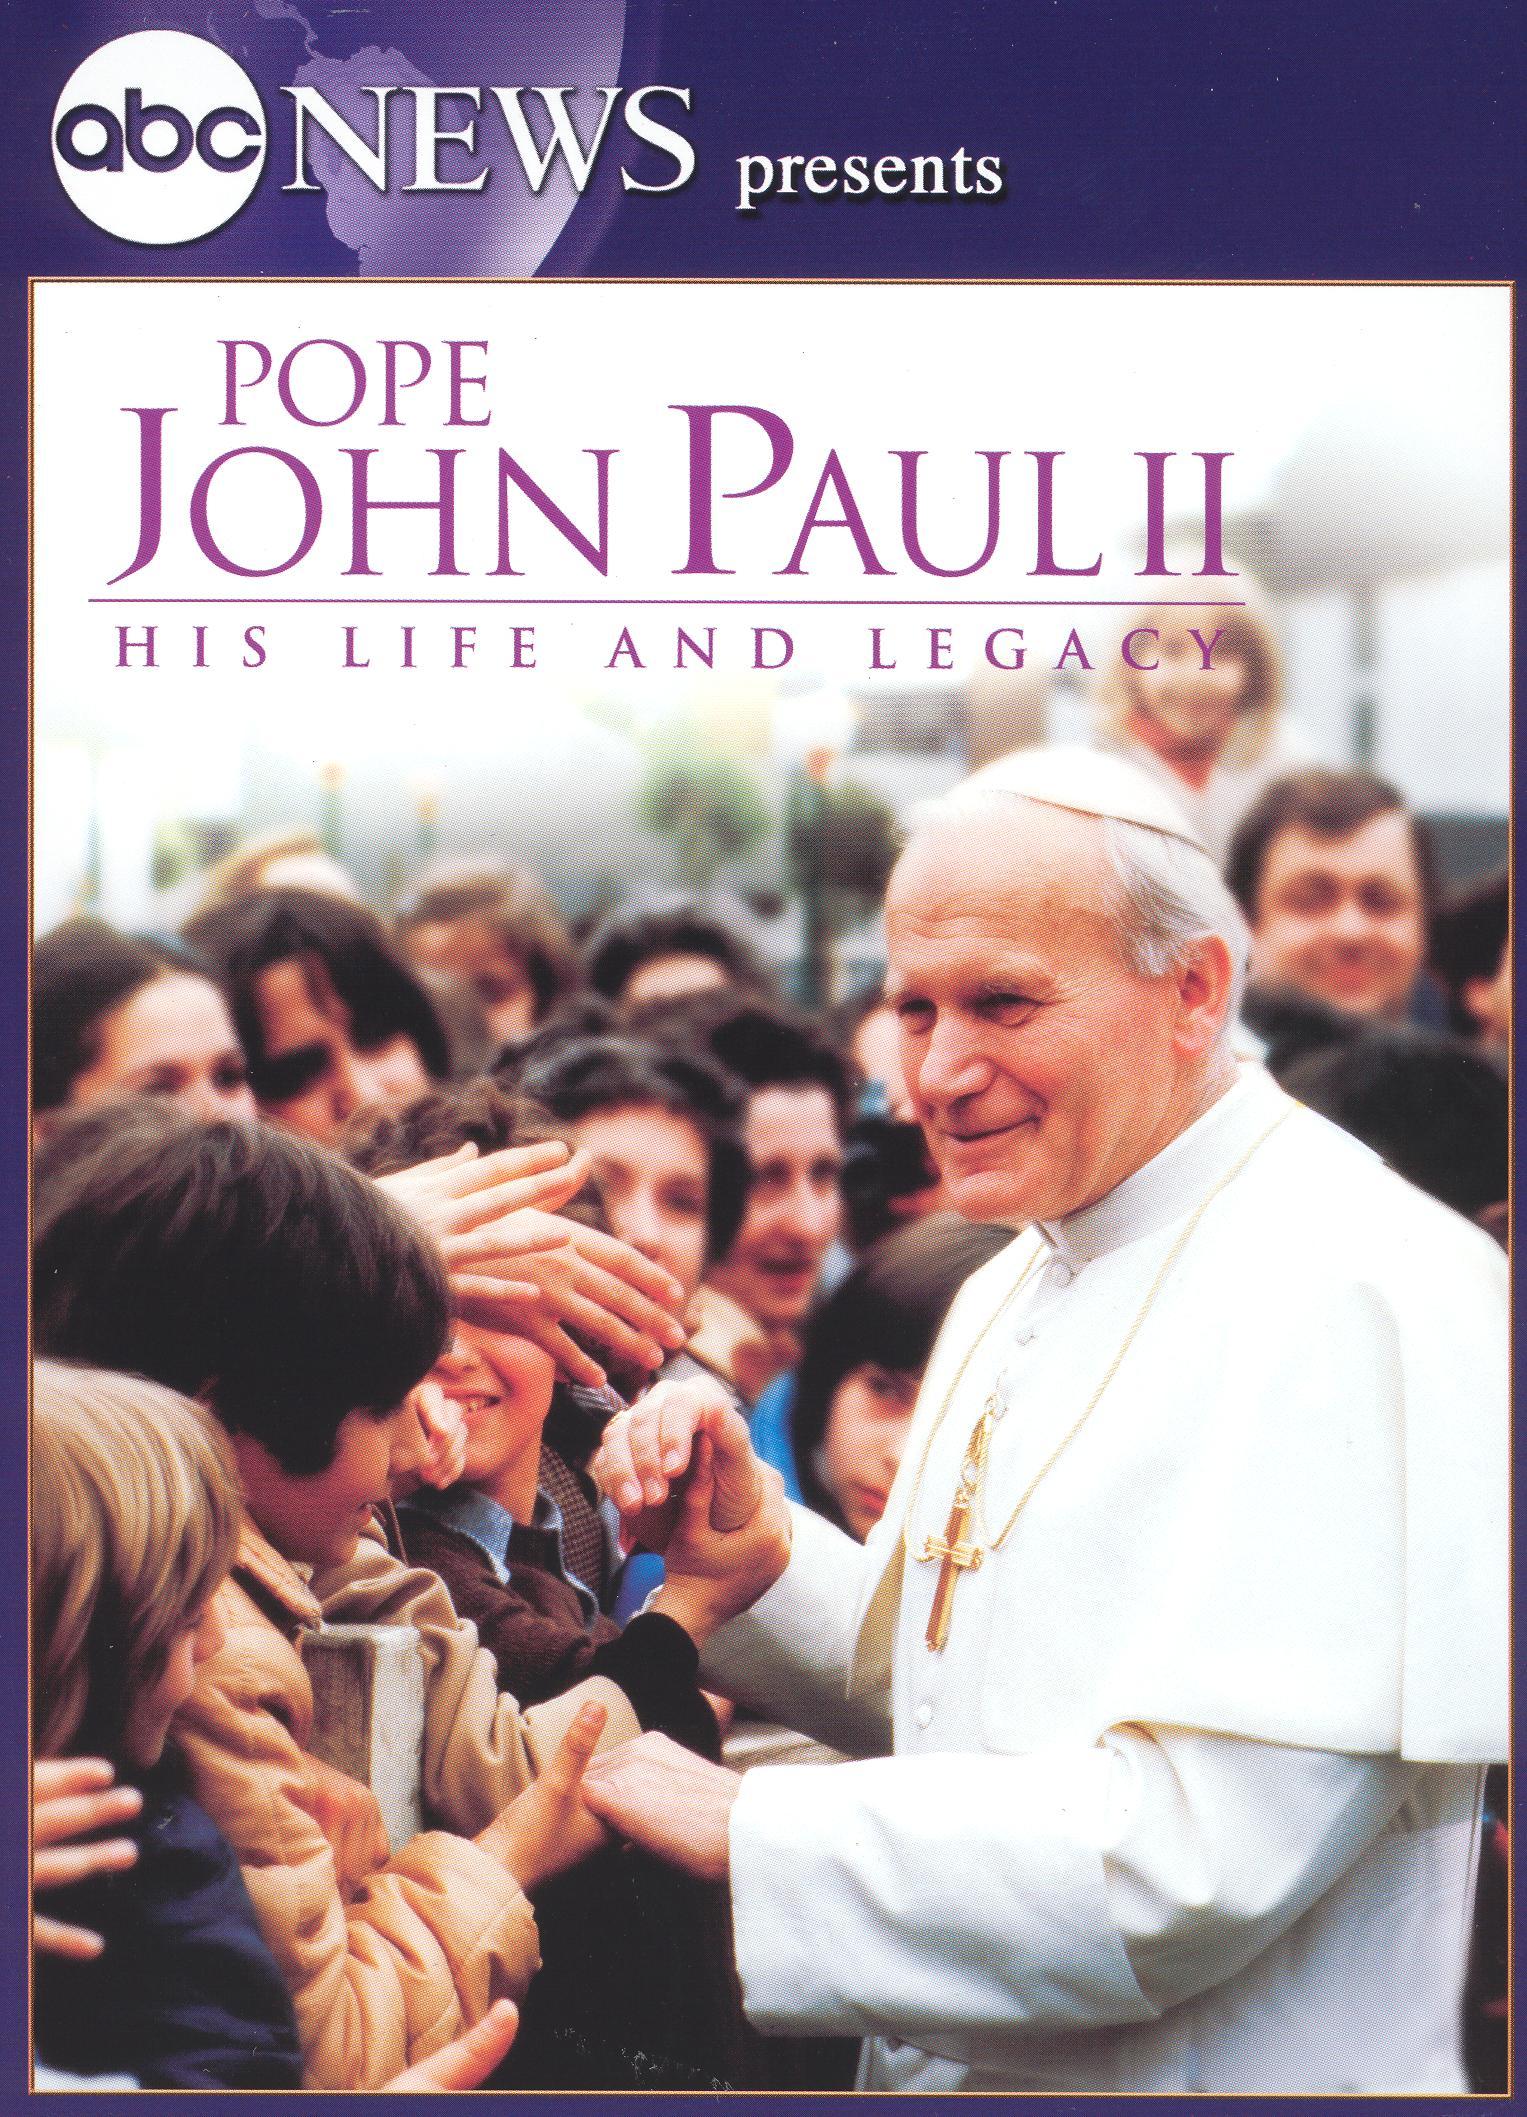 Pope John Paul II: His Life and Legacy